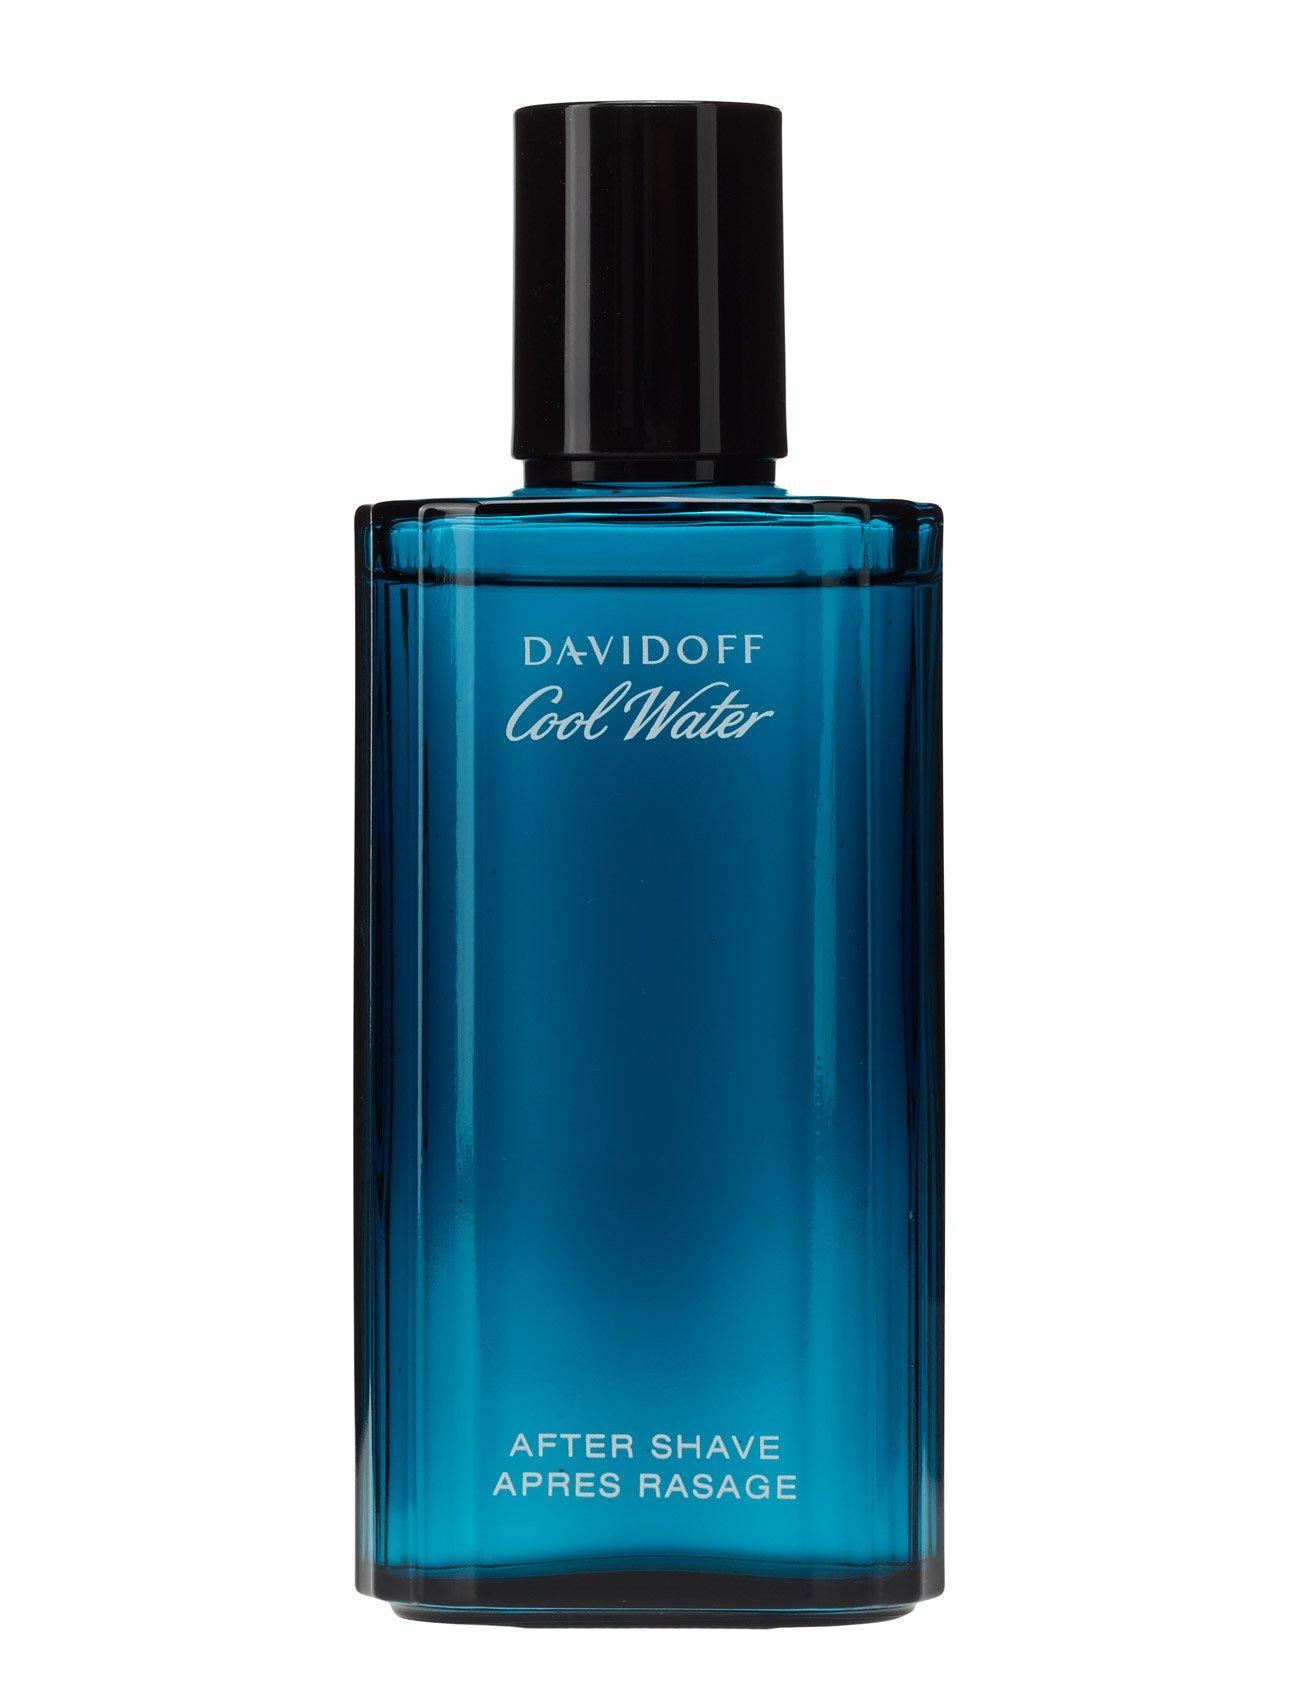 Davidoff - Cool Water - Man - After Shave Splash 75 ml.